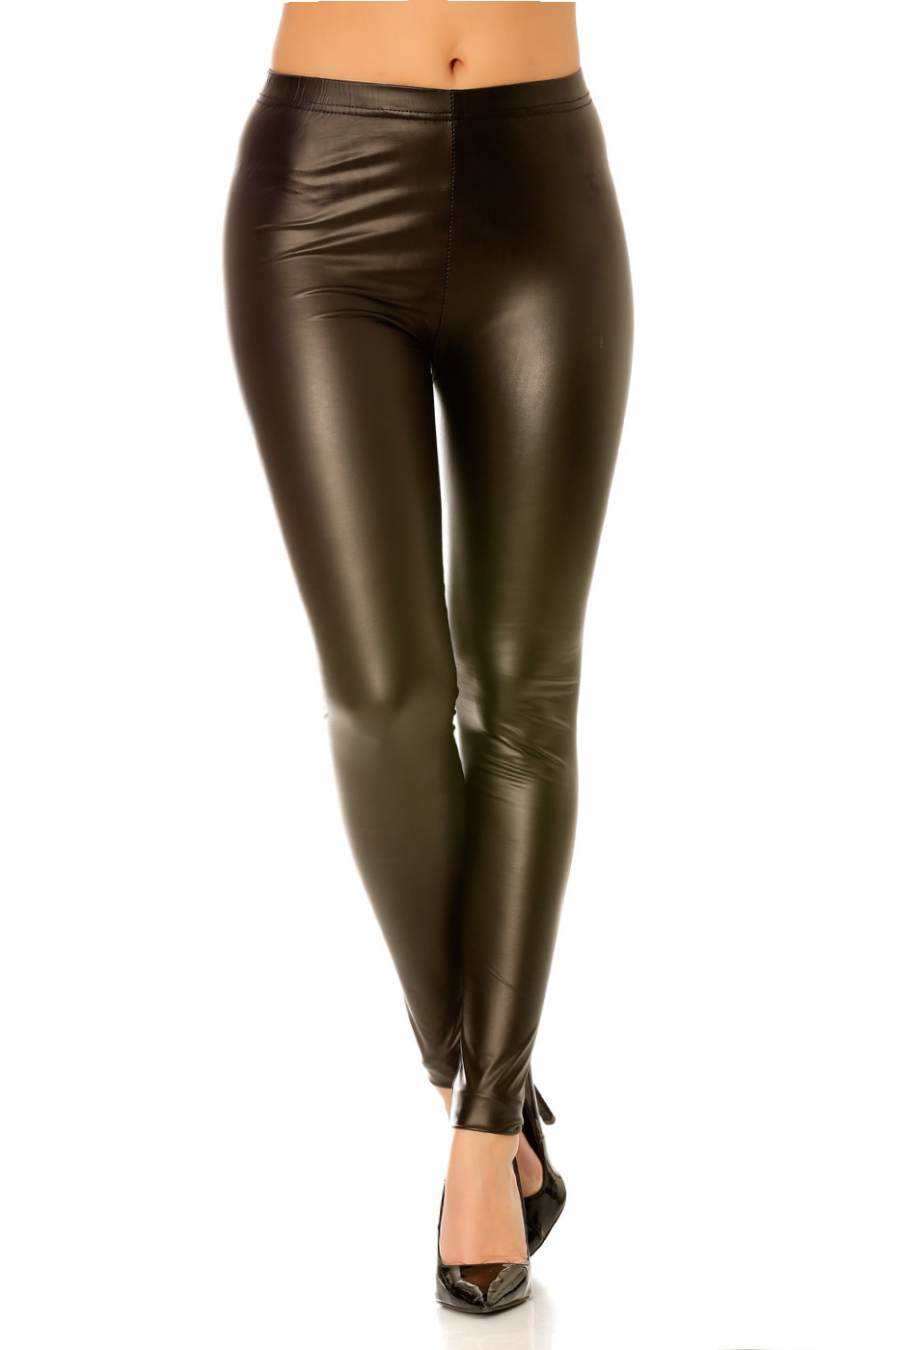 Black imitation leather low waist leggings. 9909